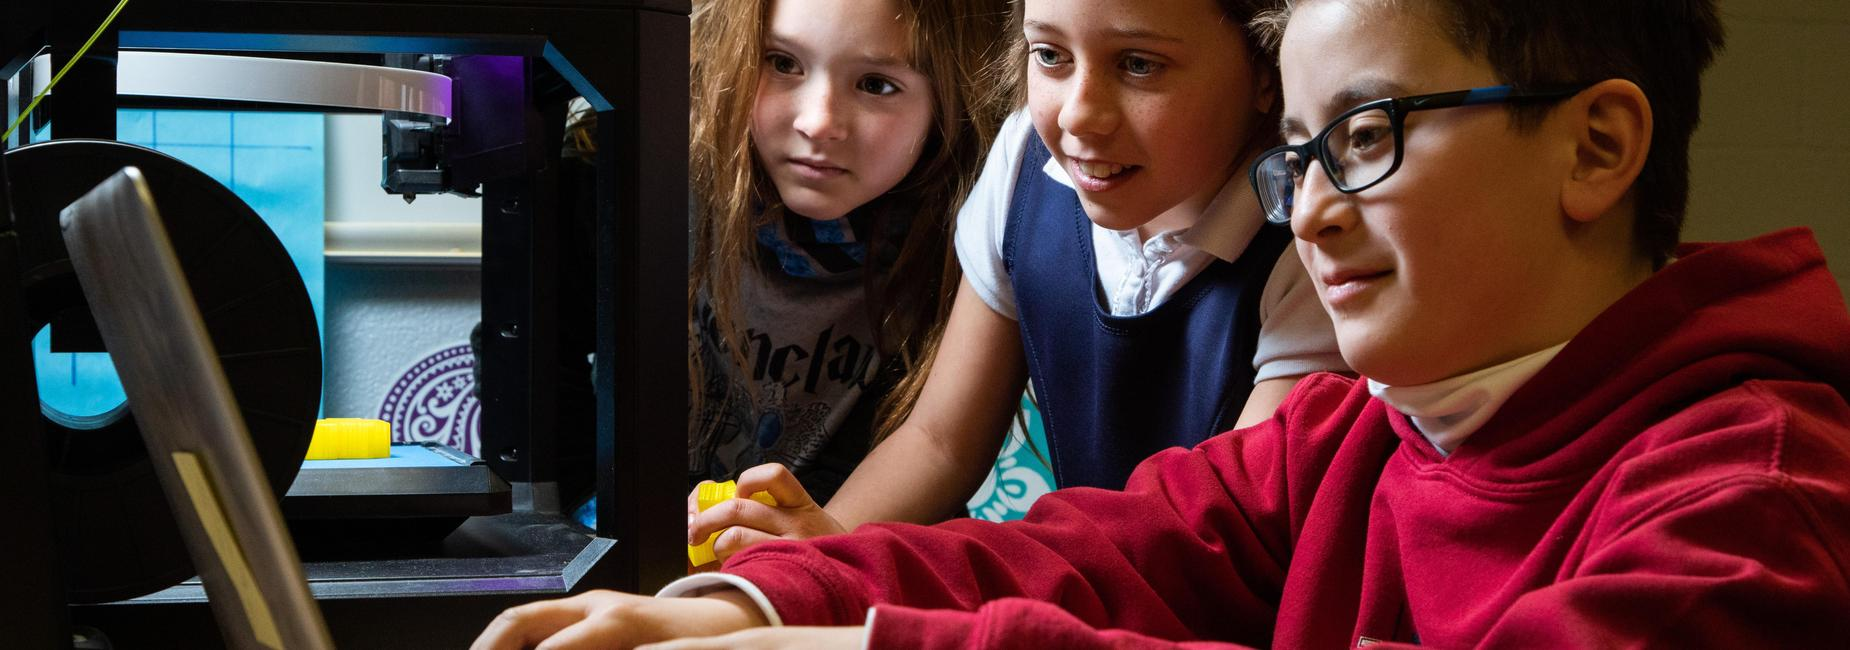 Elementary Computer Lab